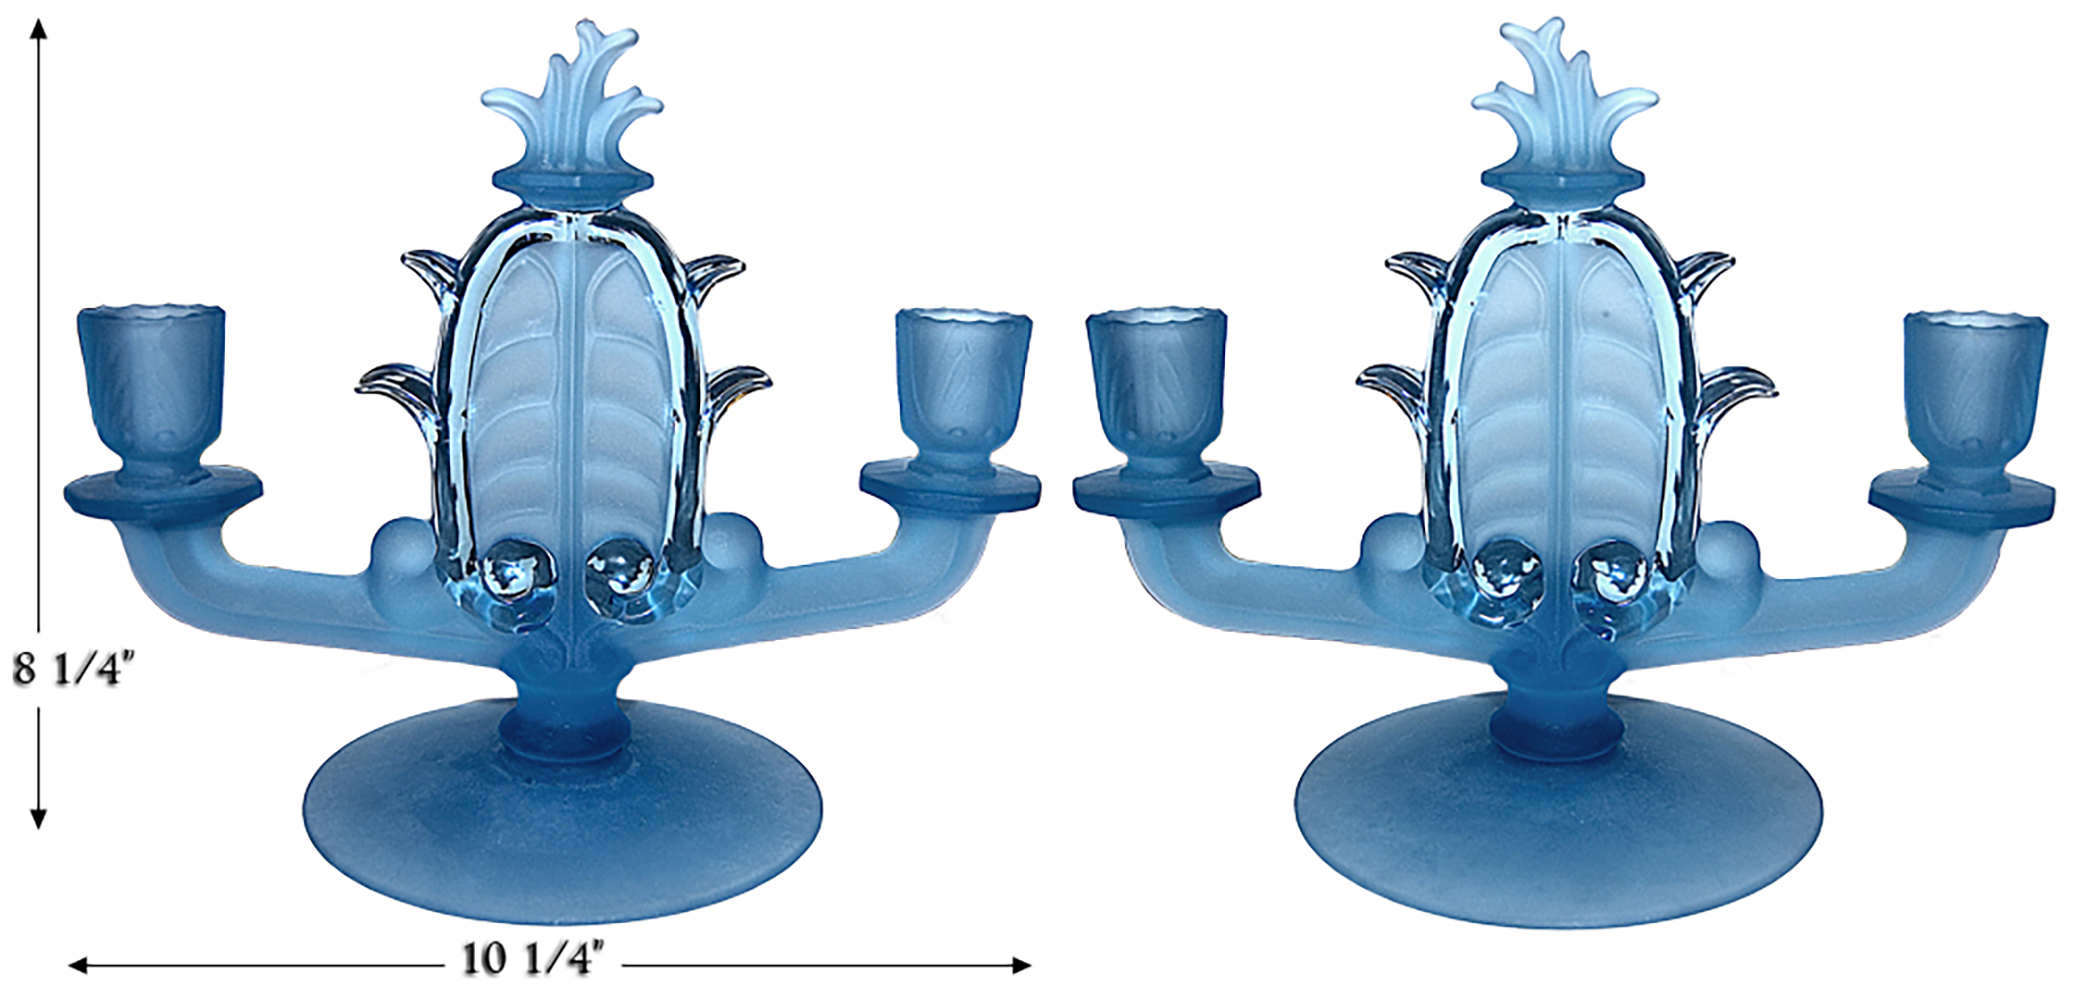 Fenton Velva Frosty Blue Candlesticks